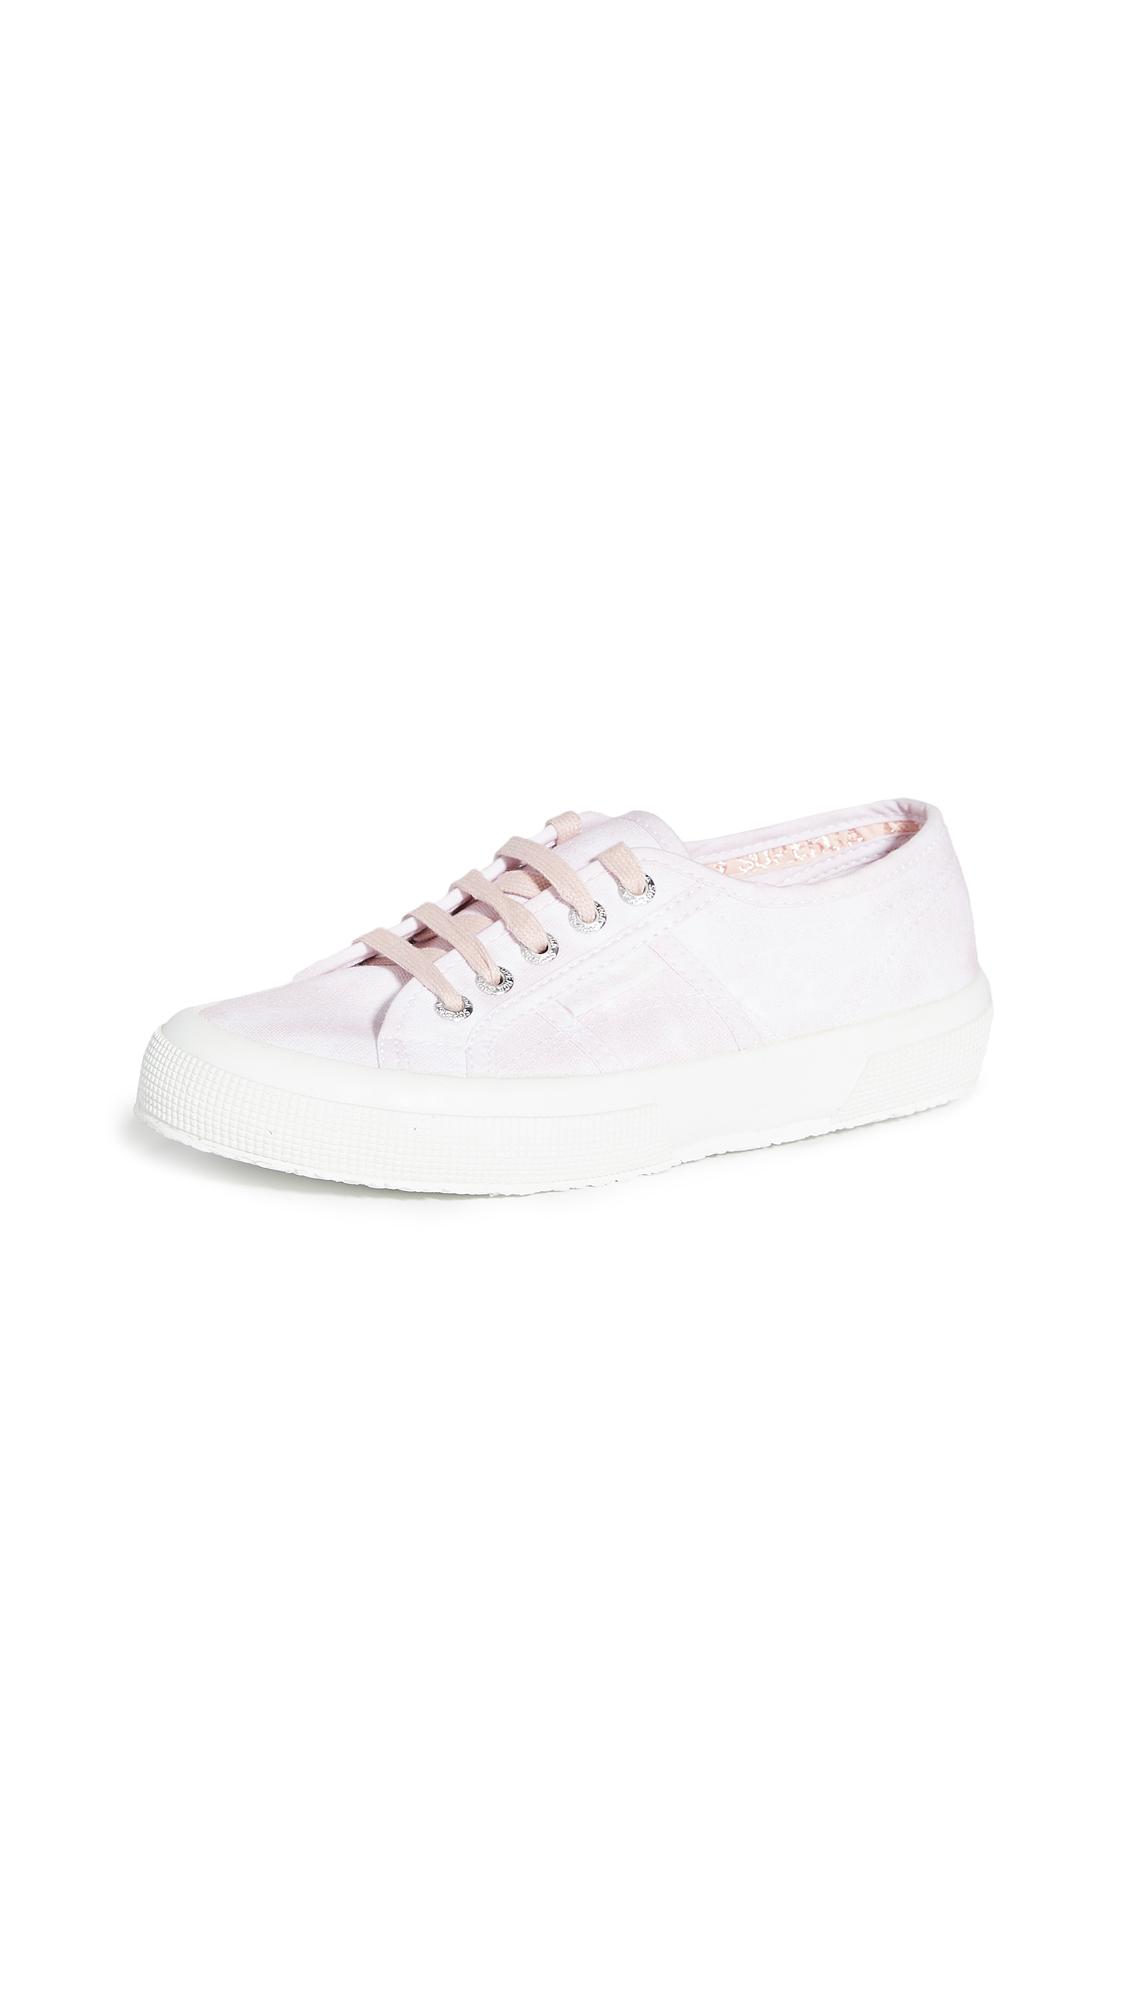 Superga 2750 Fantasy Cotu Sneakers - 40% Off Sale